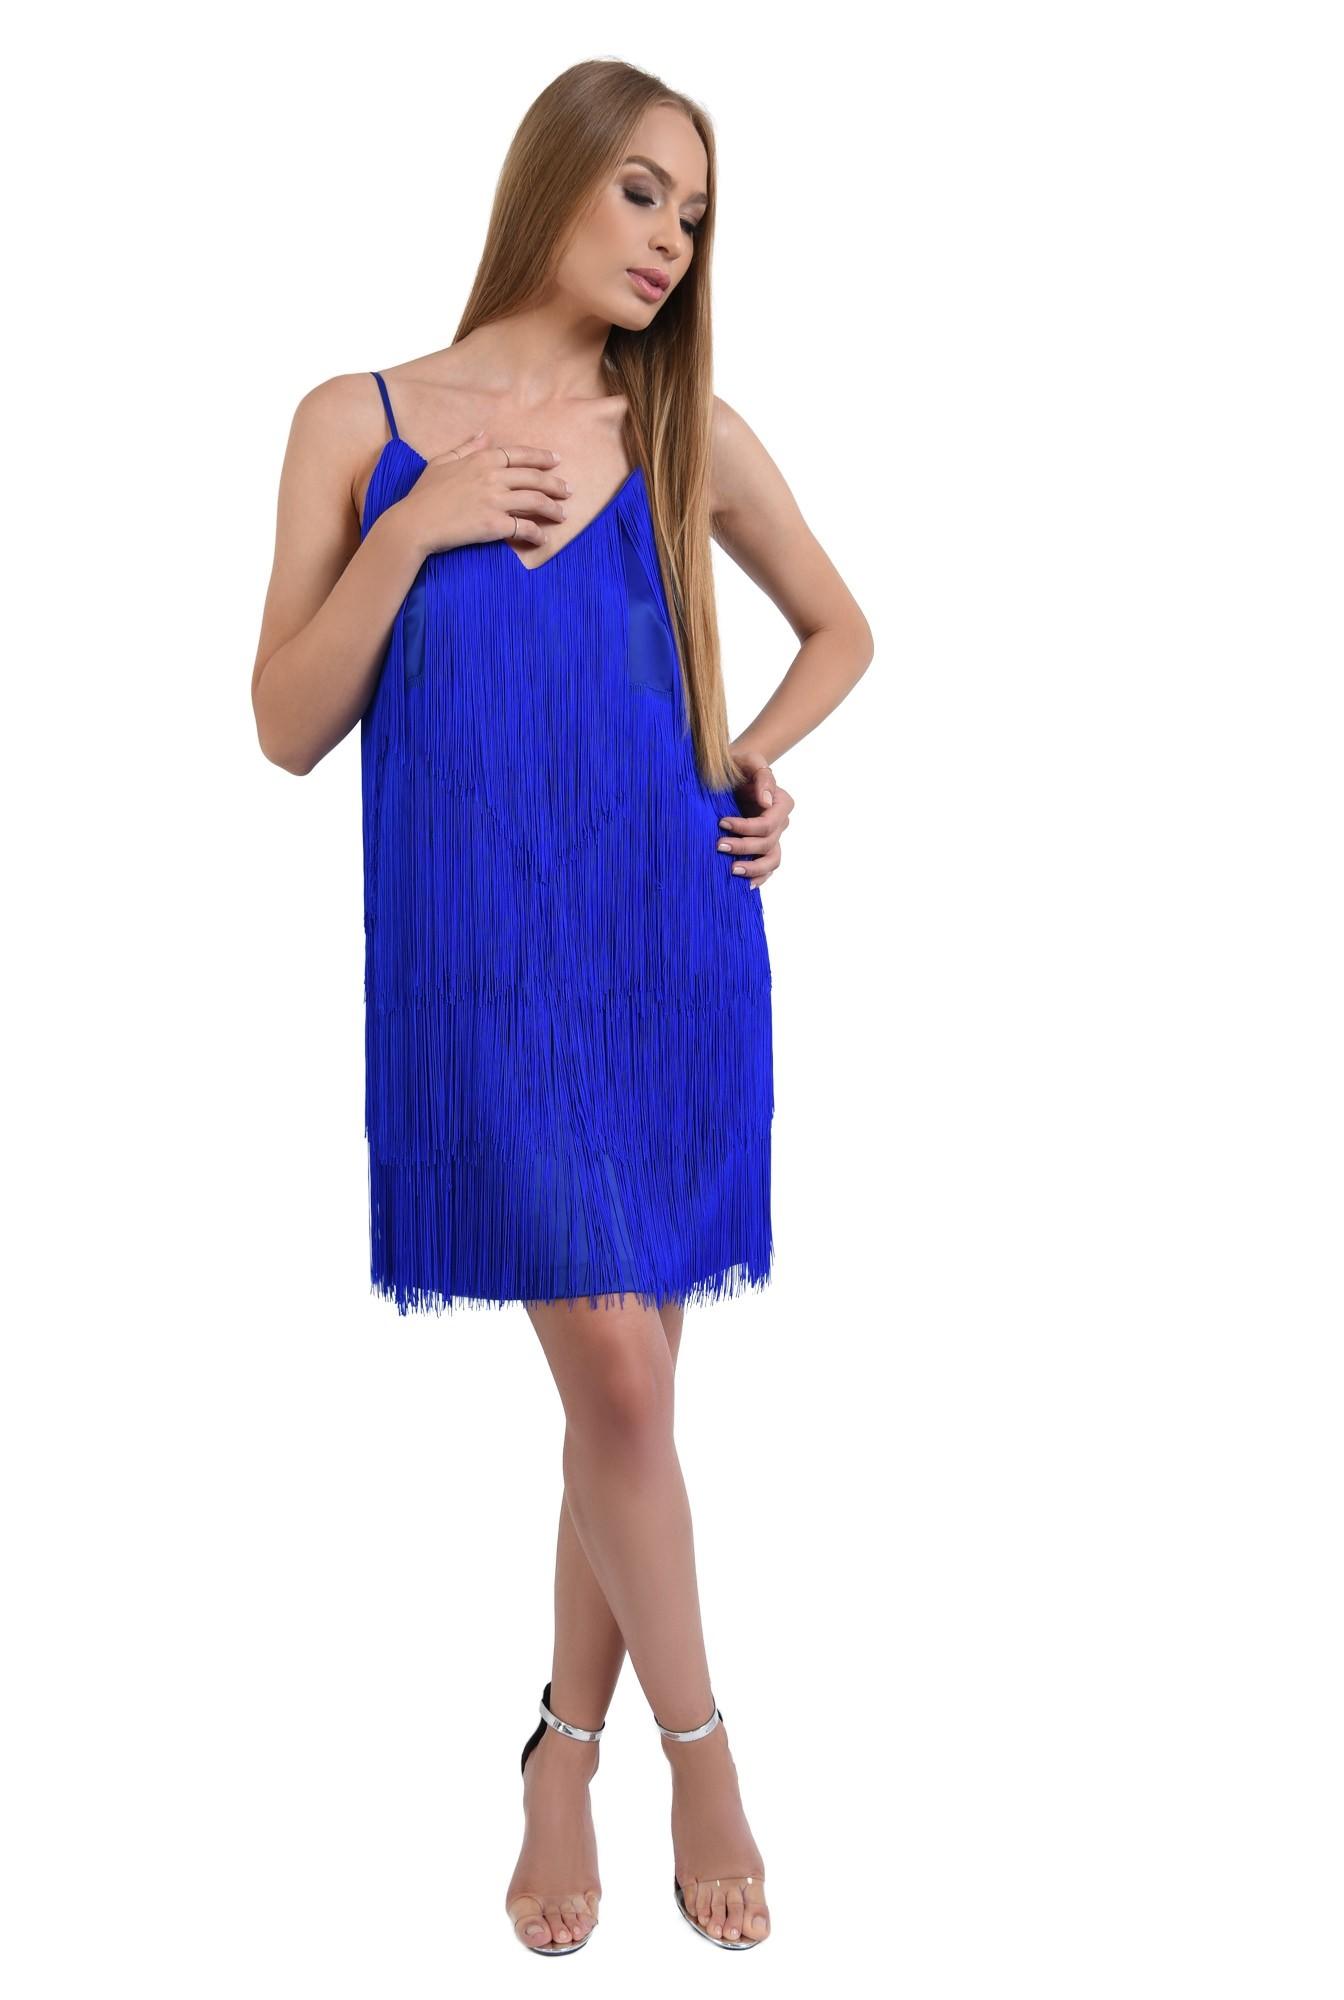 3 - 360 - rochie de seara albastra, cu frajuri, slip on, croi drept, anchior